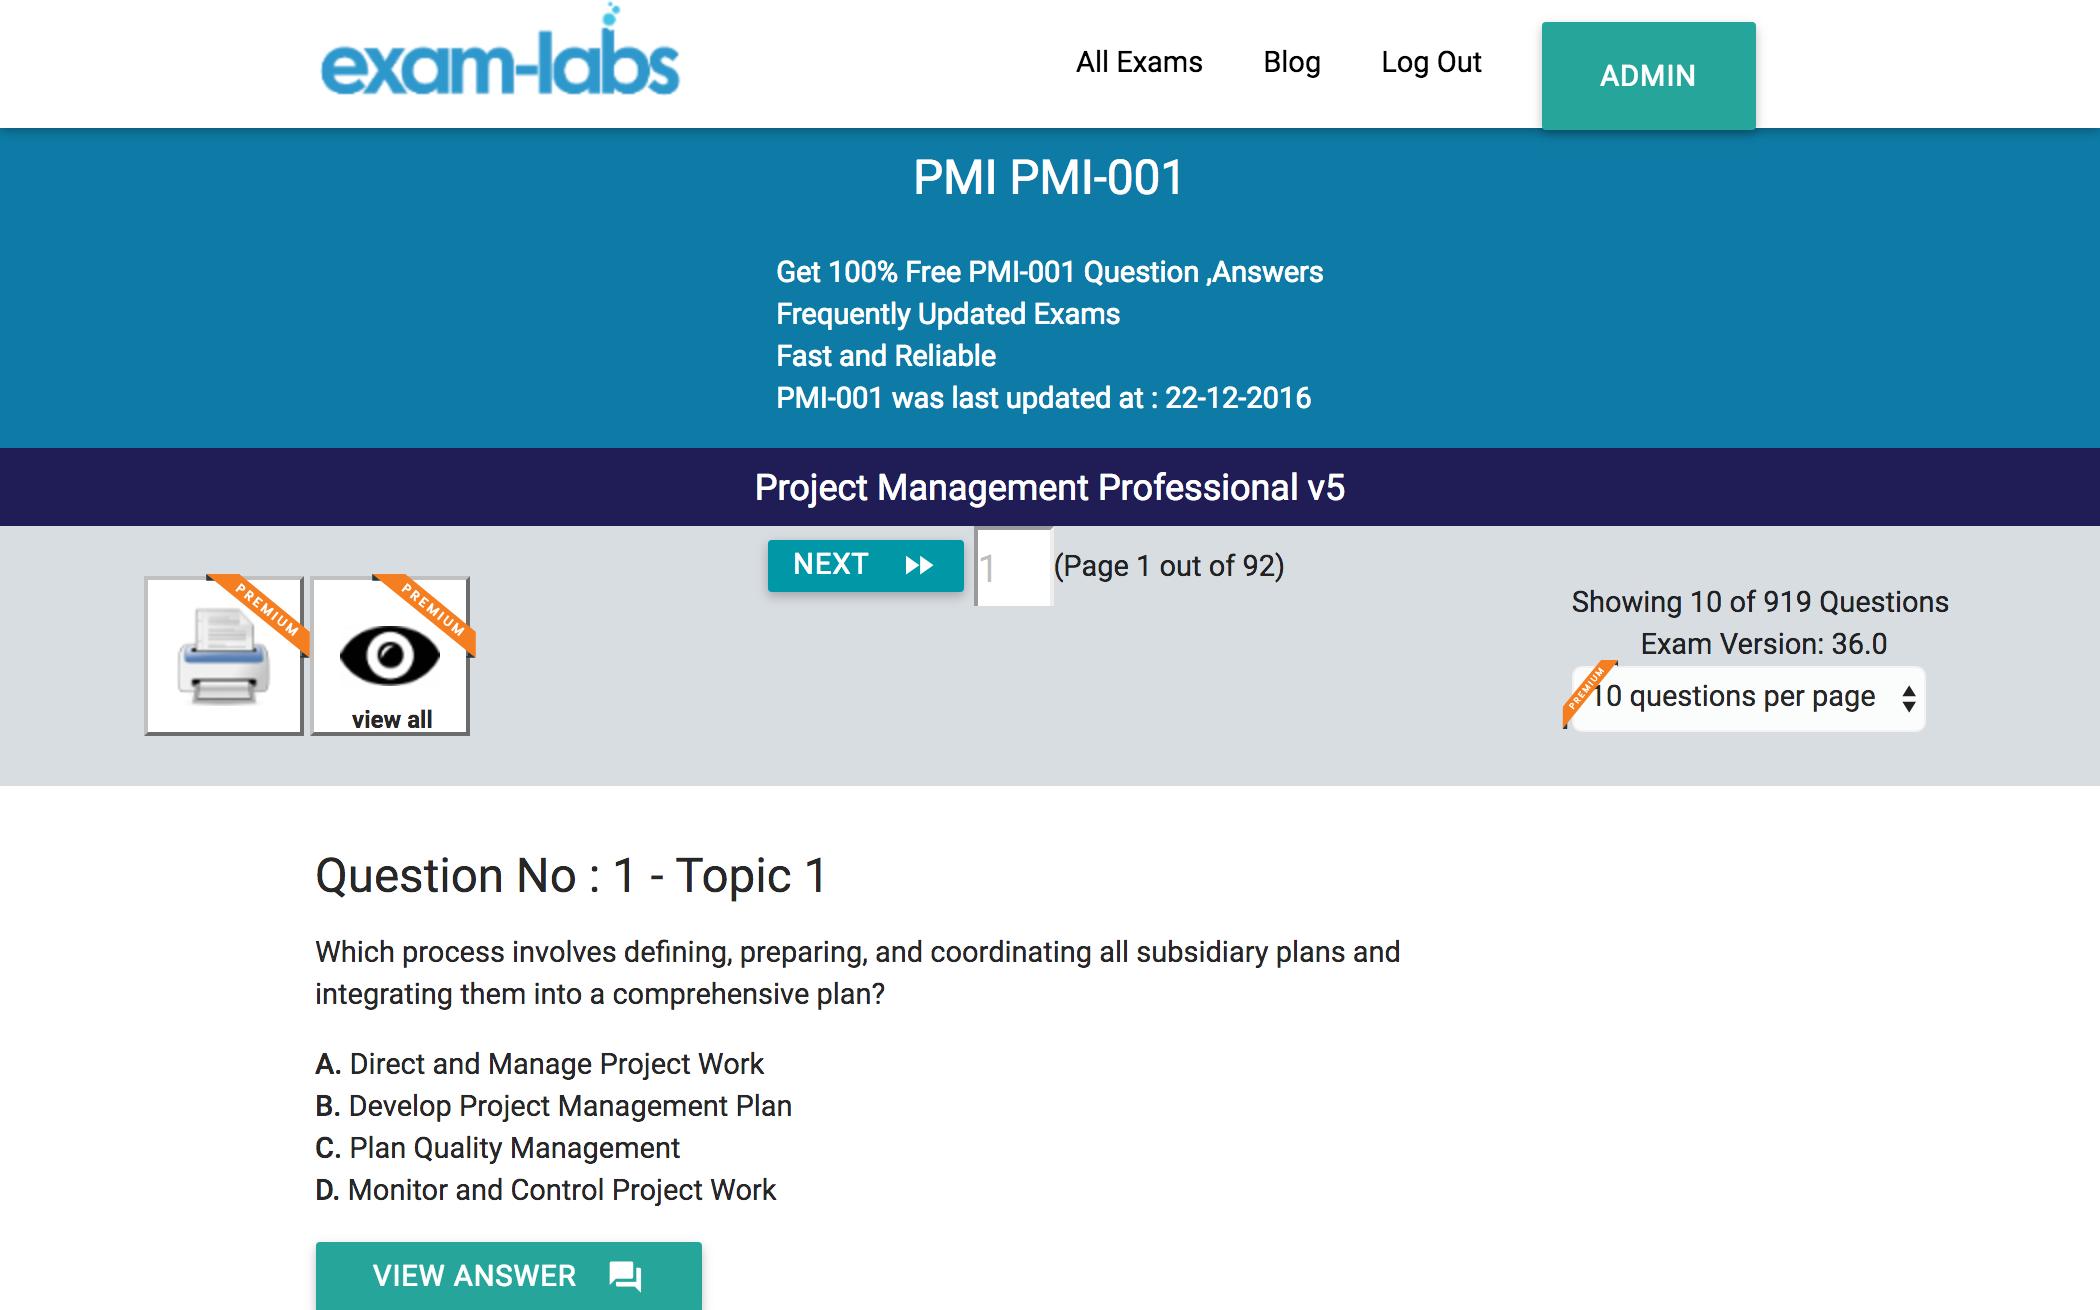 Pmi 001 pmi real exam questions 100 free exam labs project management professional v5 exam start pmi 001 exam pmi 001practiceexam1 xflitez Gallery